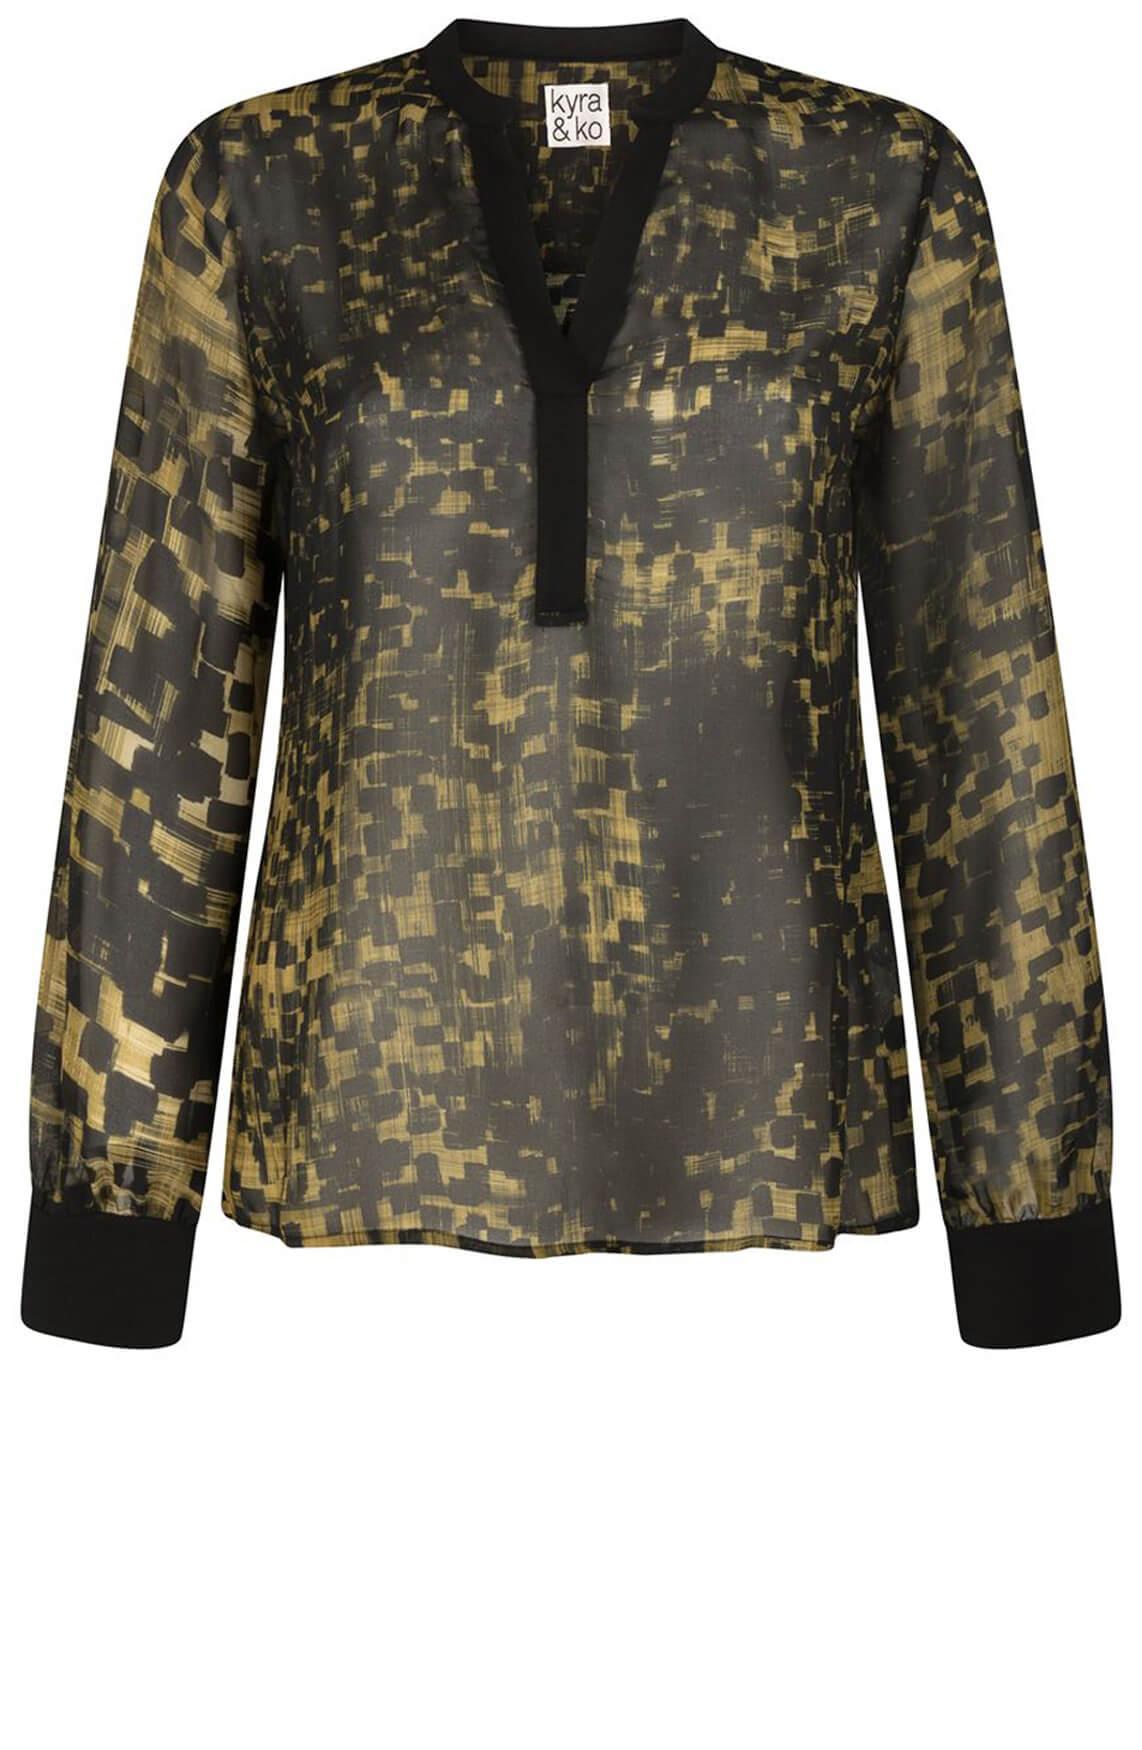 Kyra & Ko Dames Rozemarijn blouse Groen